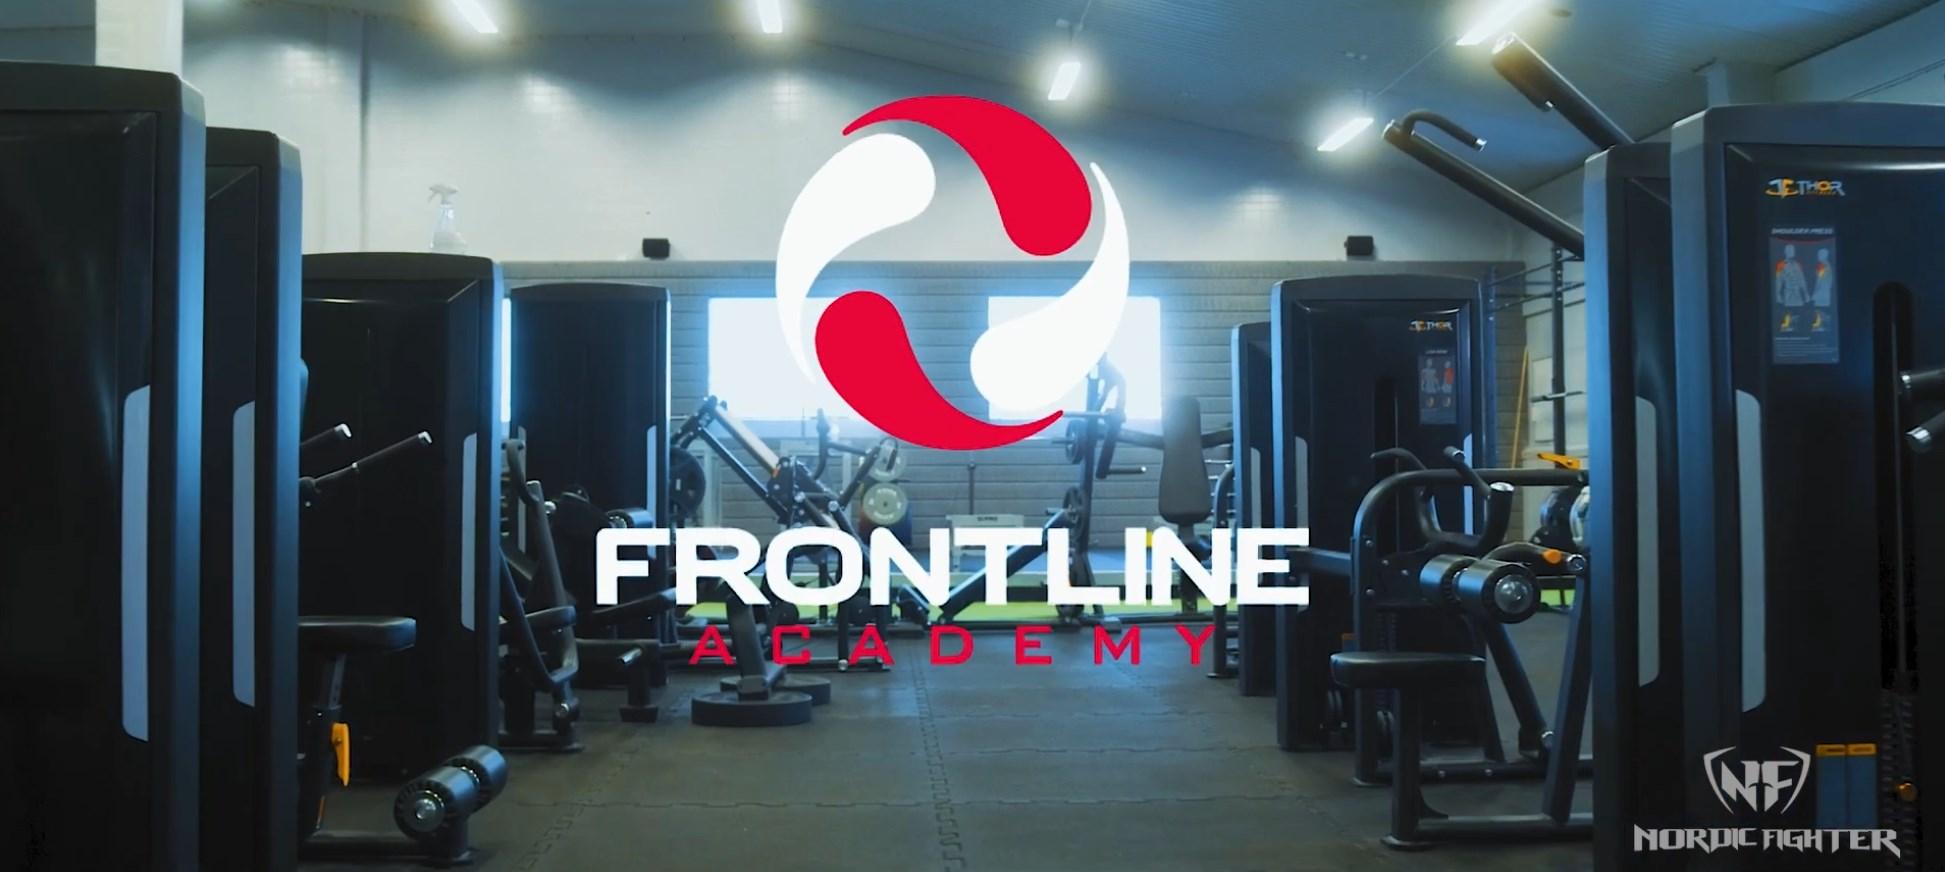 Frontline Atletklubb